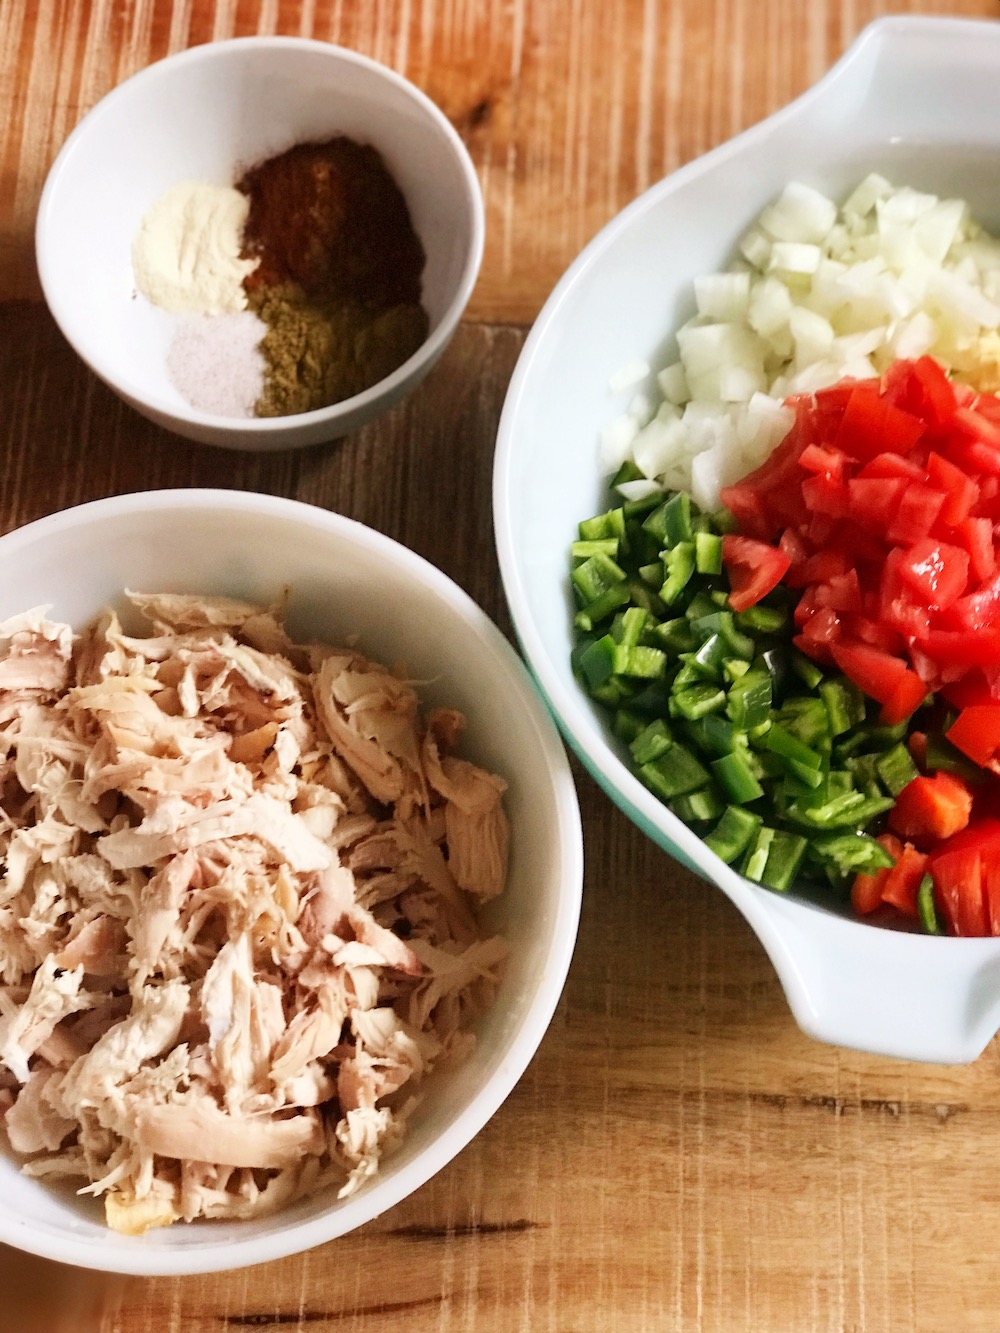 Ingredients for White Chicken Chili